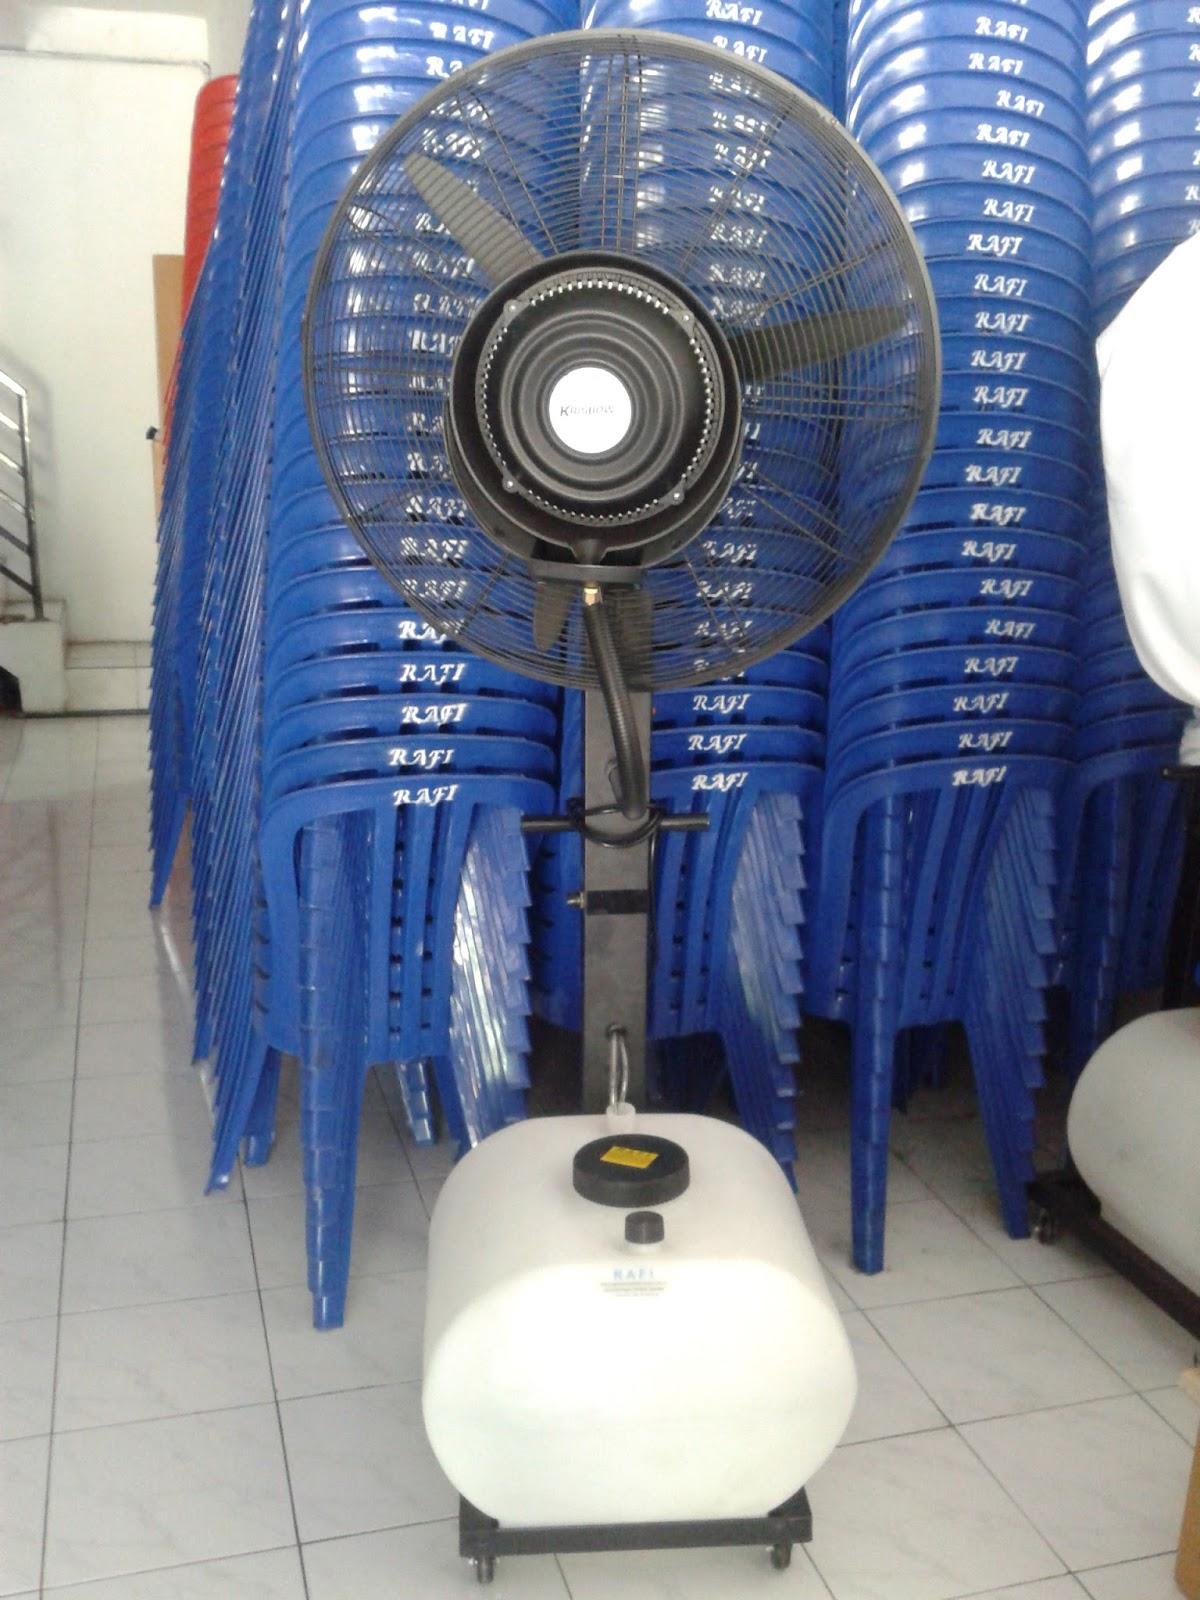 Alat Pesta Surabaya Sewa Kipas Angin Blower Air Cooler